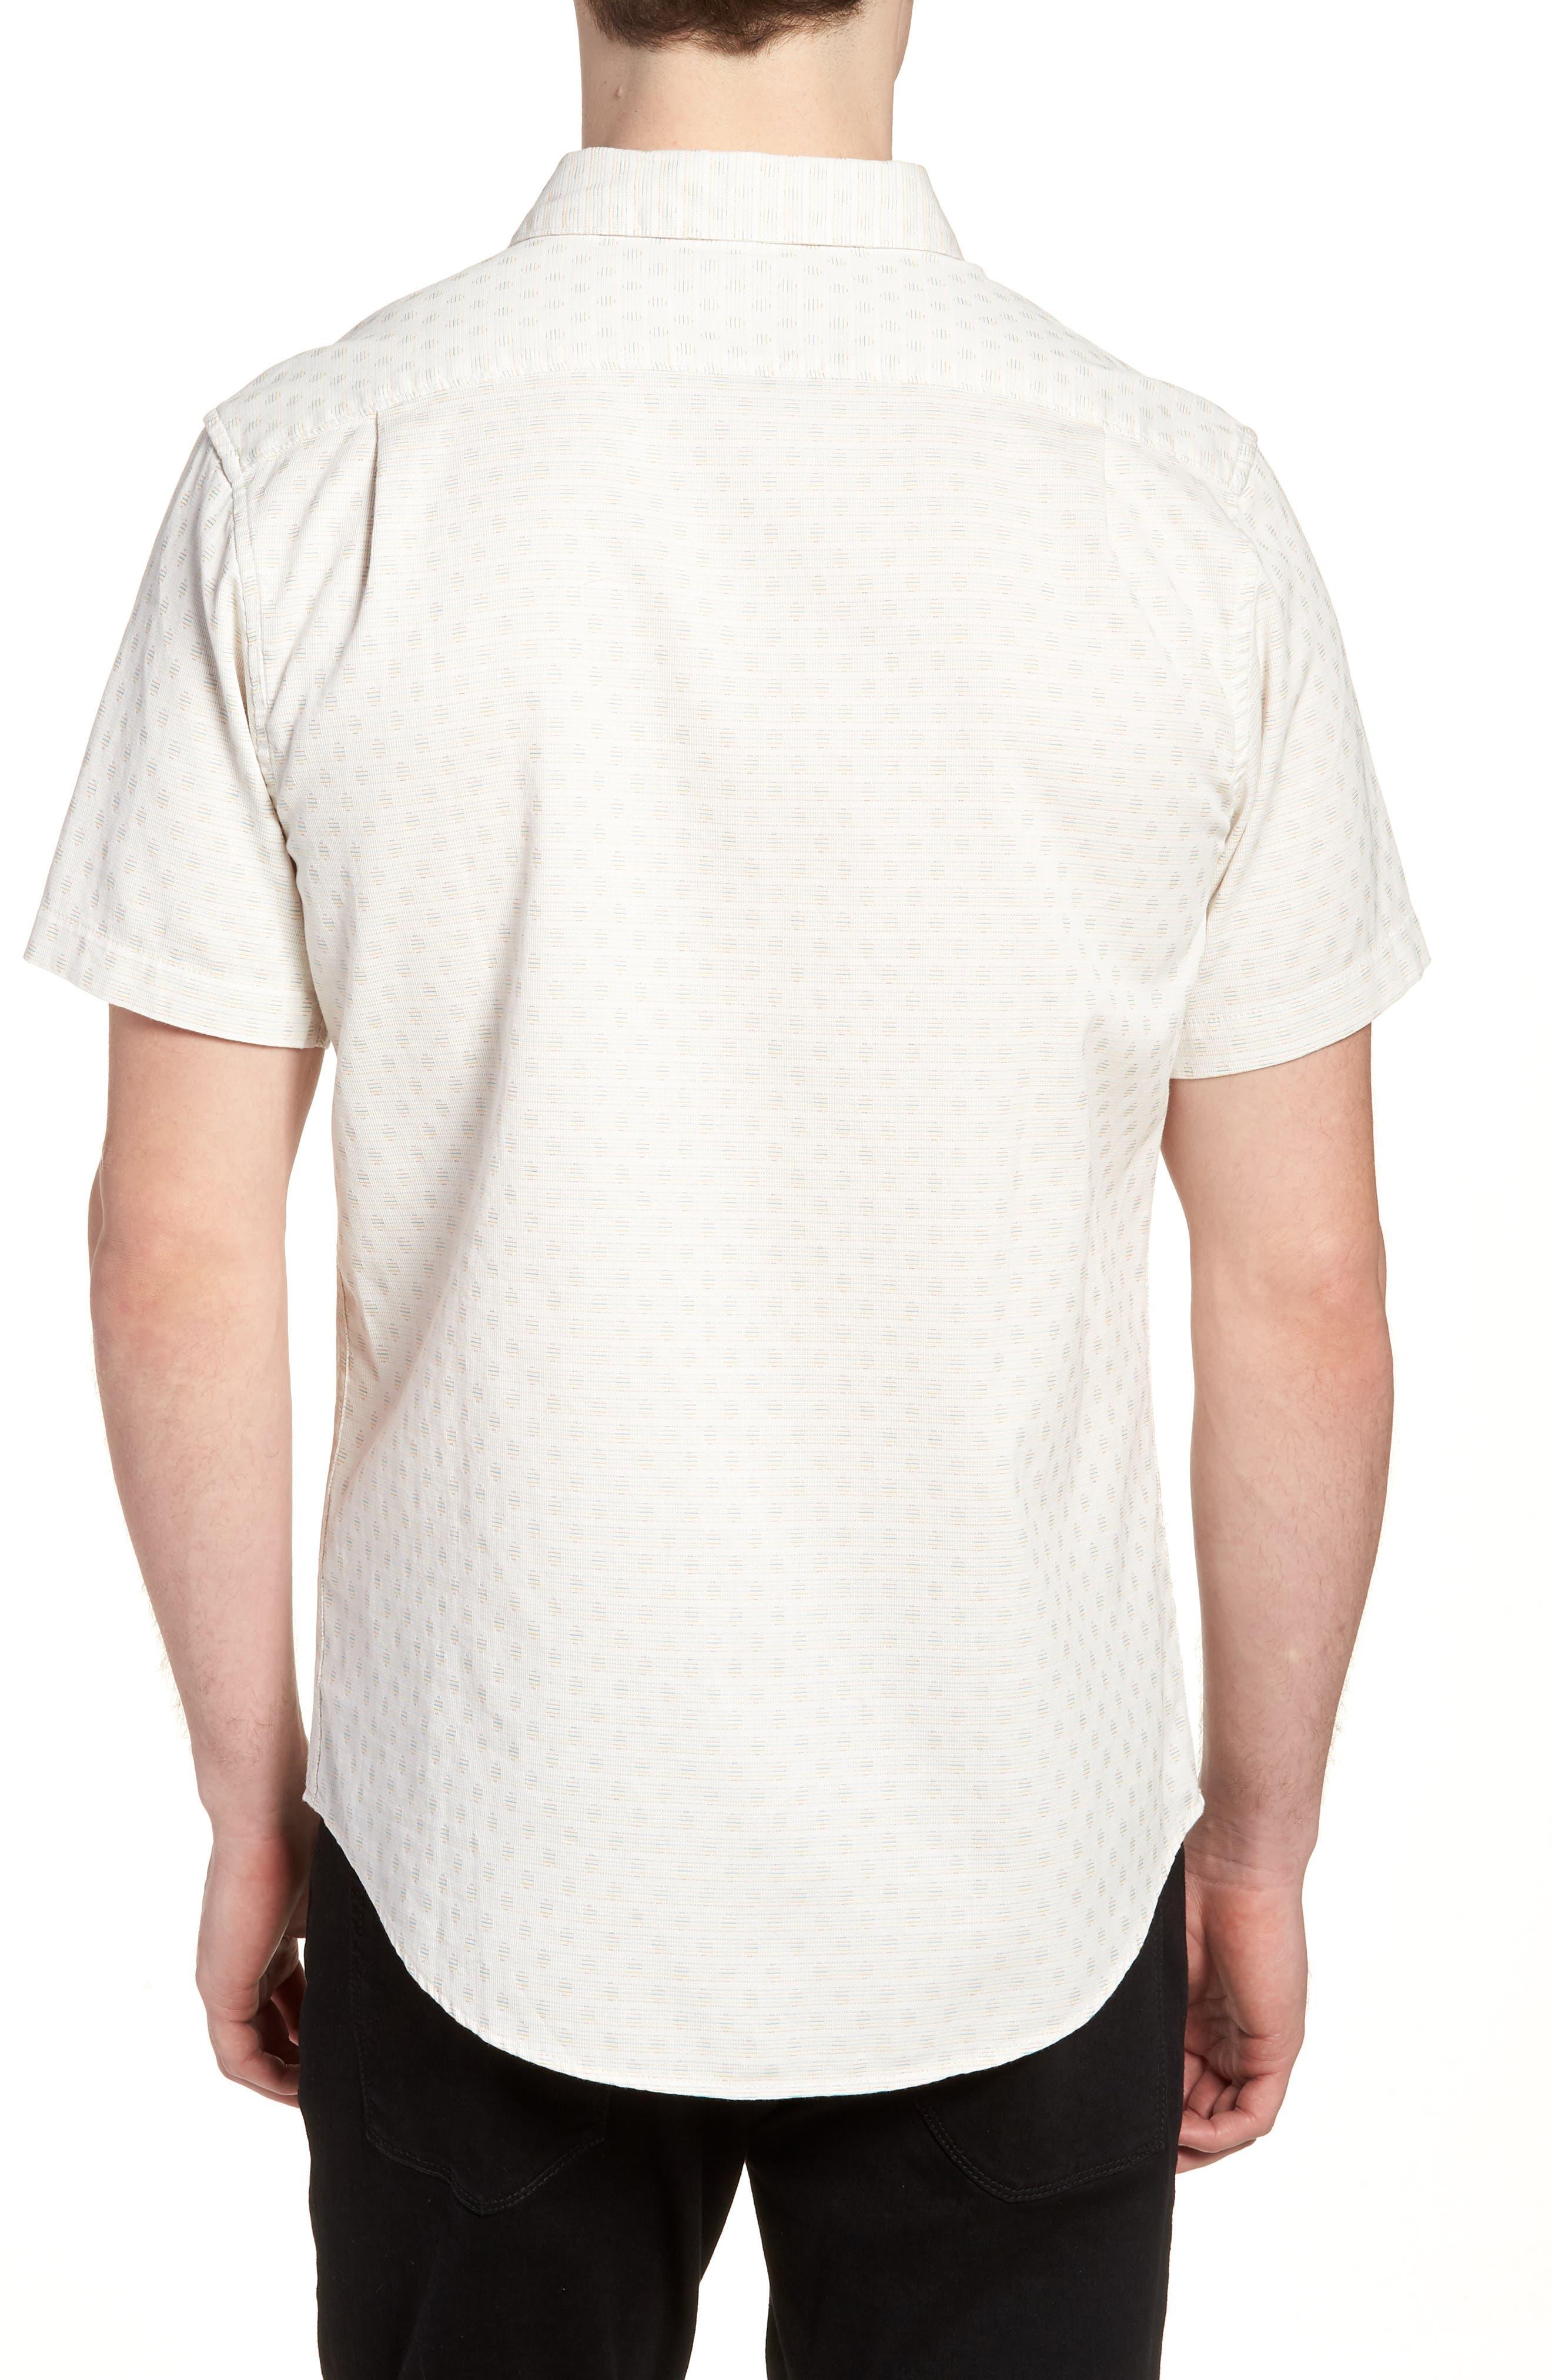 D2 Woven Shirt,                             Alternate thumbnail 2, color,                             900